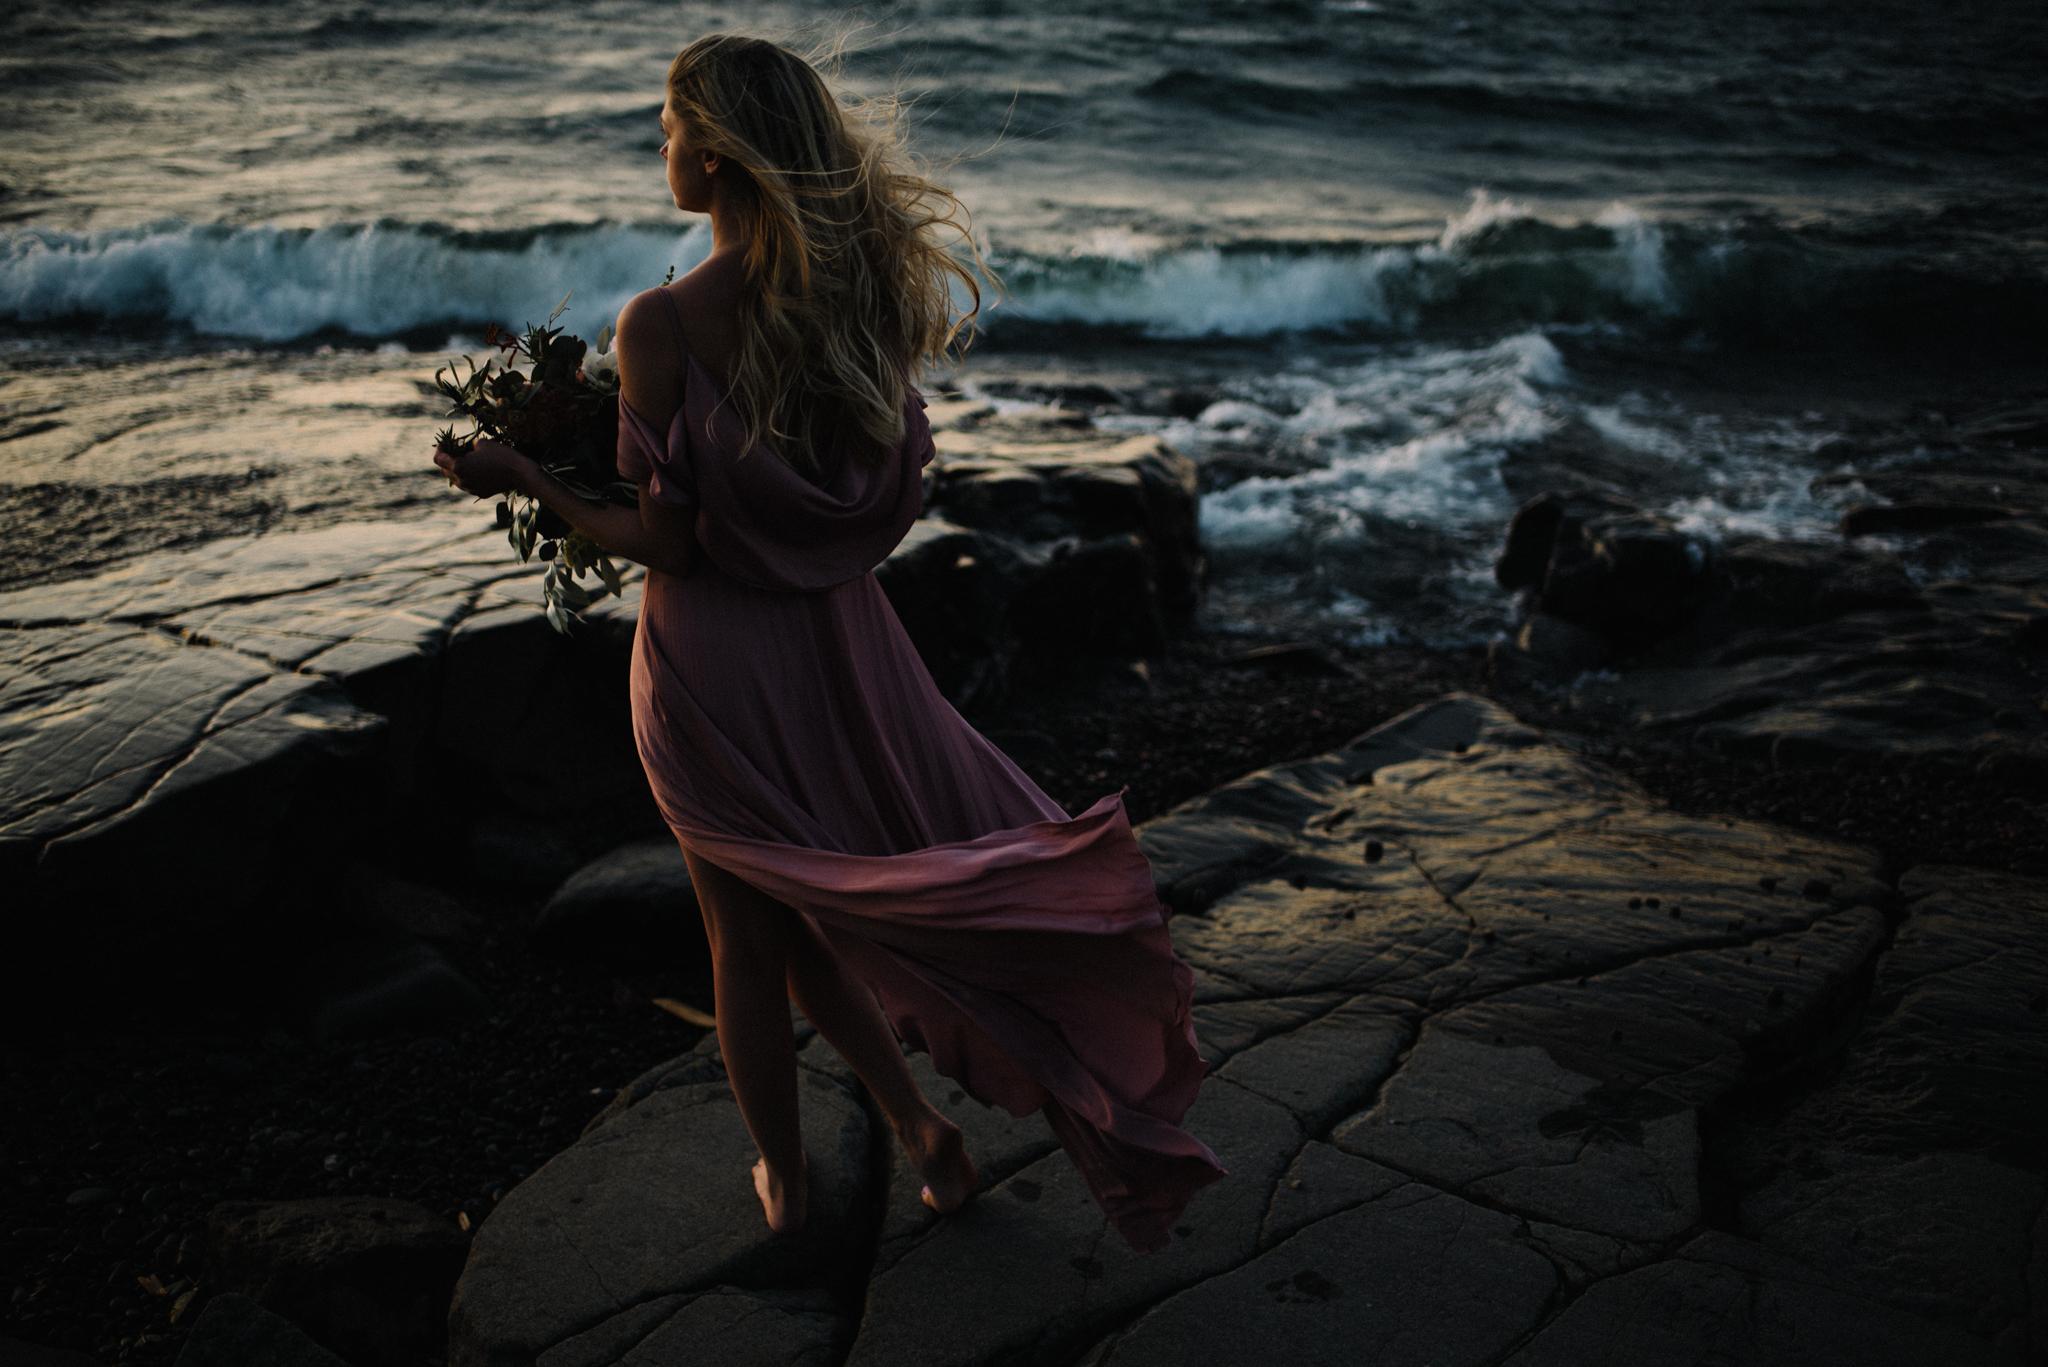 Madeira Creative - Clare Kolars - Emilee Bridal Portraits - White Sails Photography - North Shore - Lake Superior_16.JPG